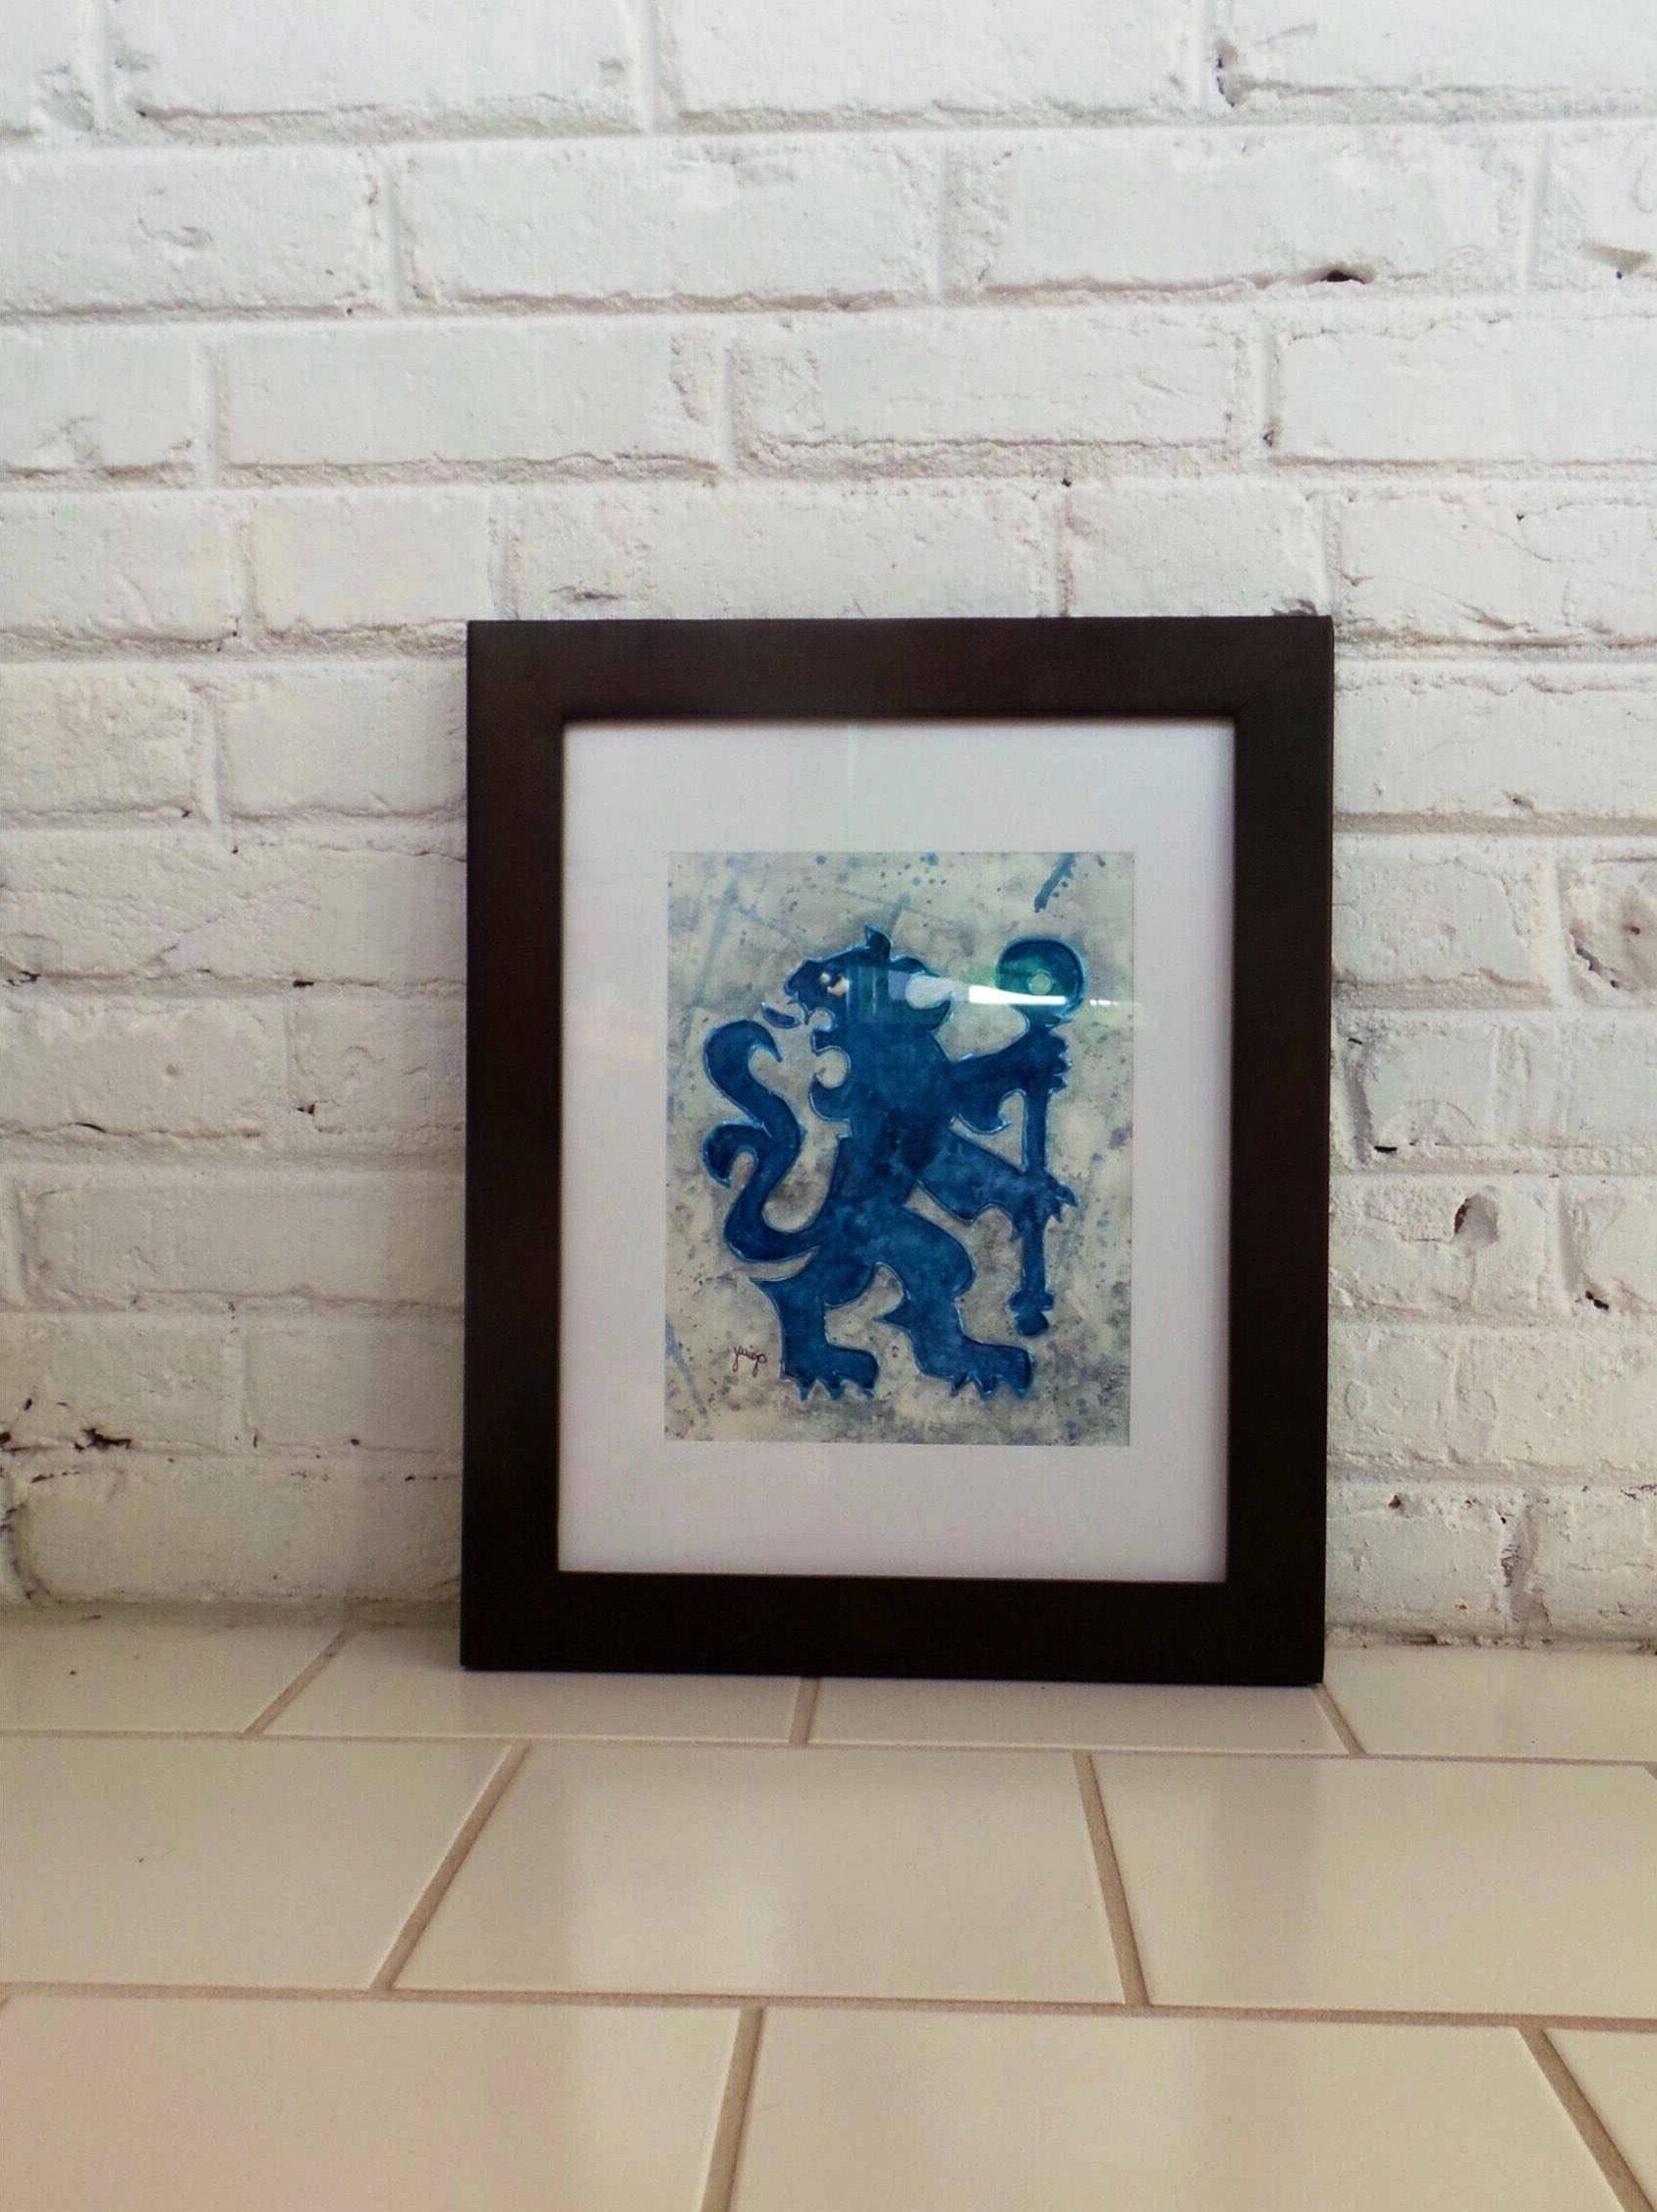 Well Liked Chelsea Fc Art, Soccer Wall Art, Soccer Fan Gift, Gift For Him Intended For Soccer Wall Art (View 10 of 15)